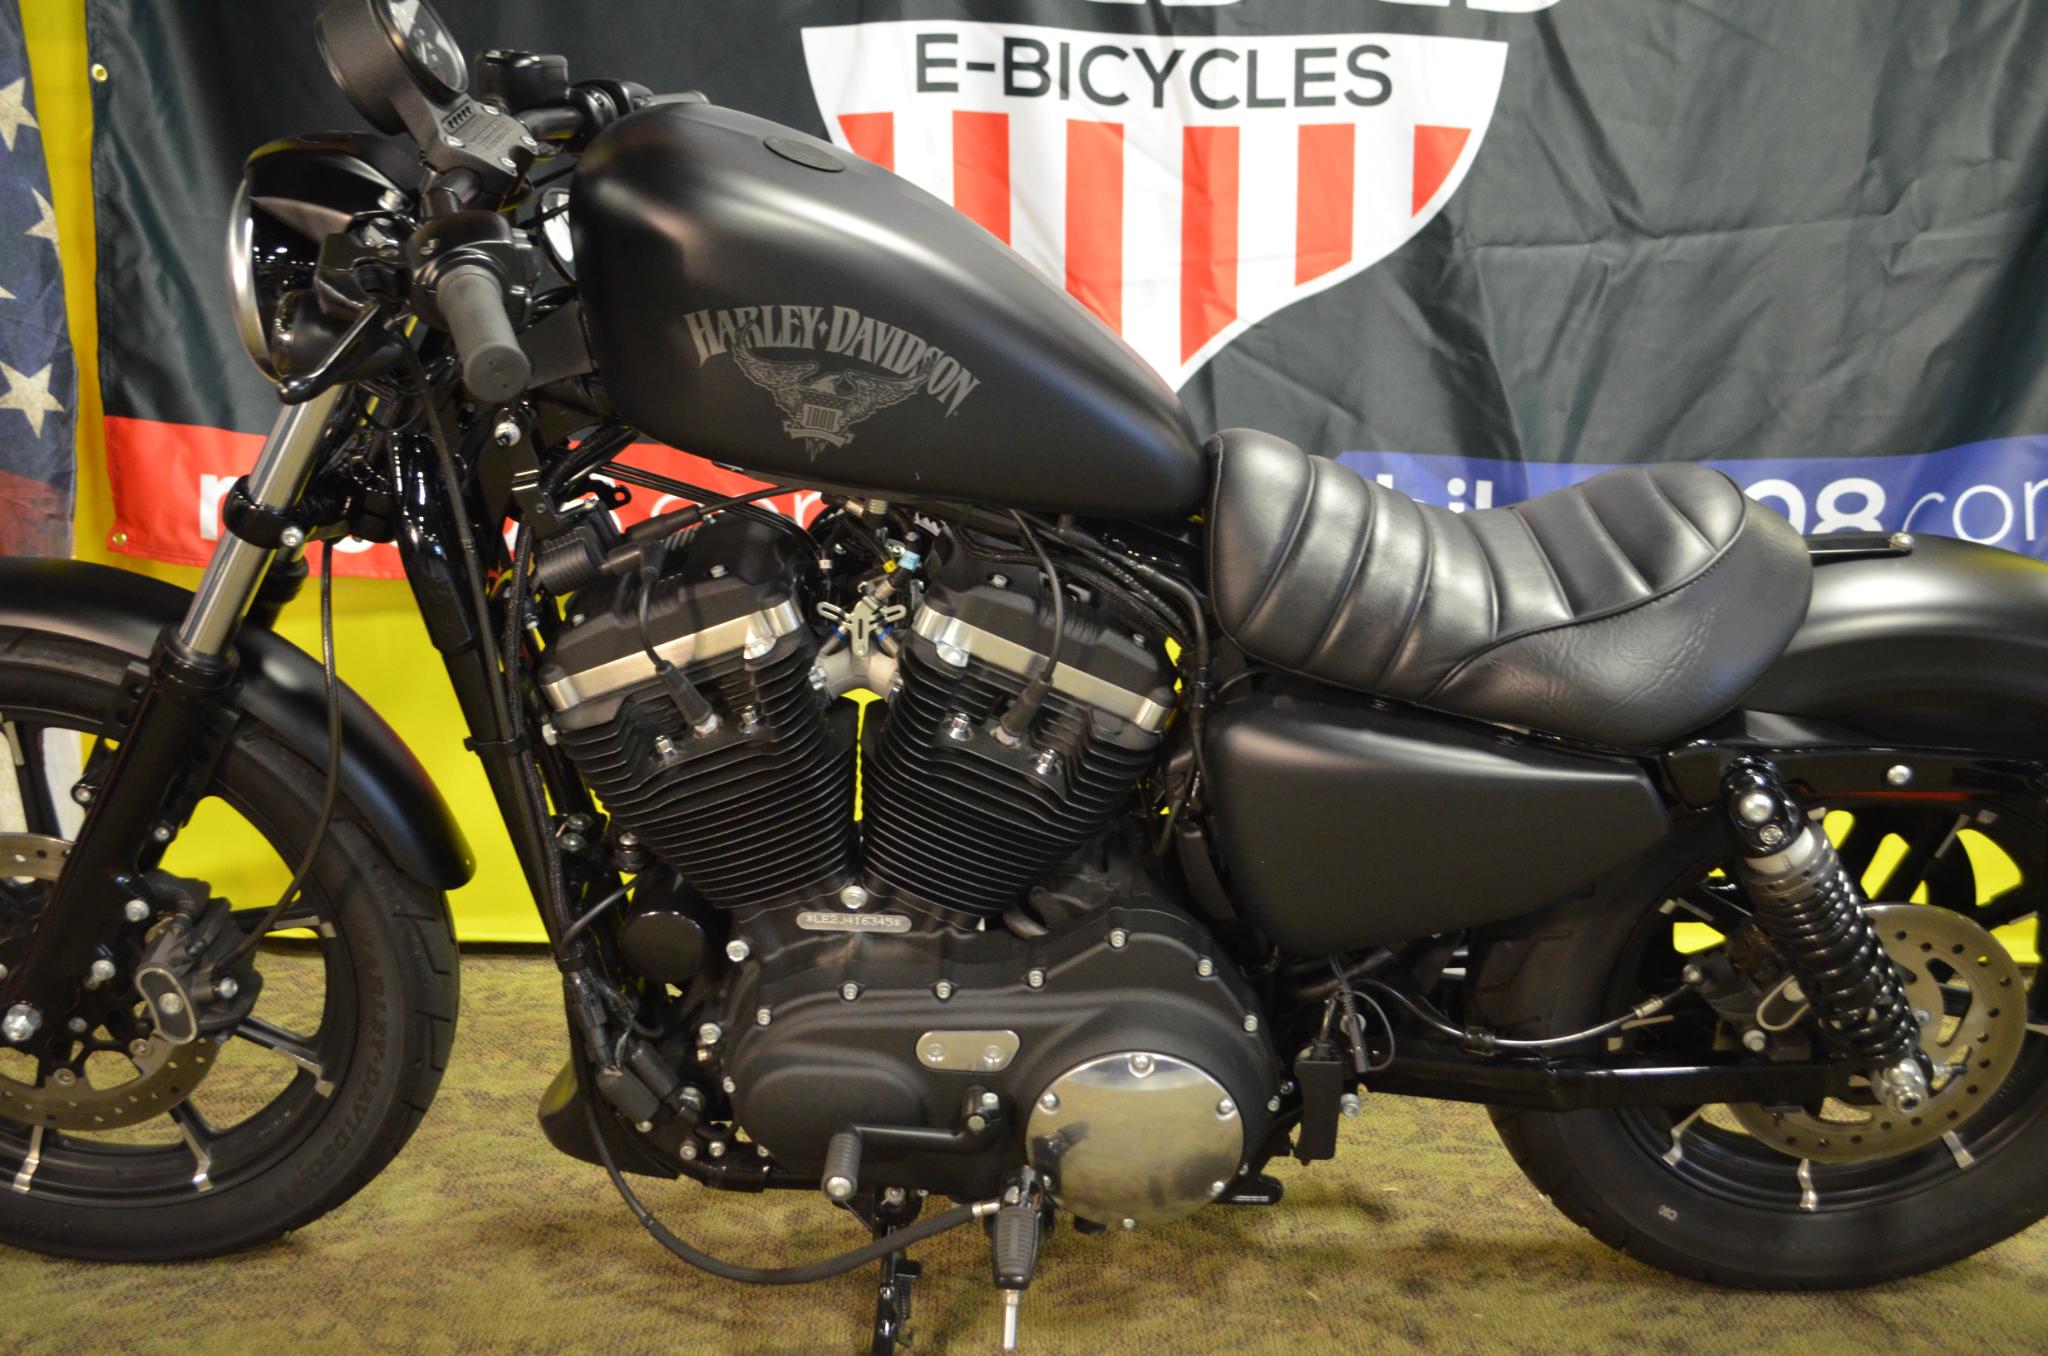 2018 Harley-Davidson Sportster 883 Iron